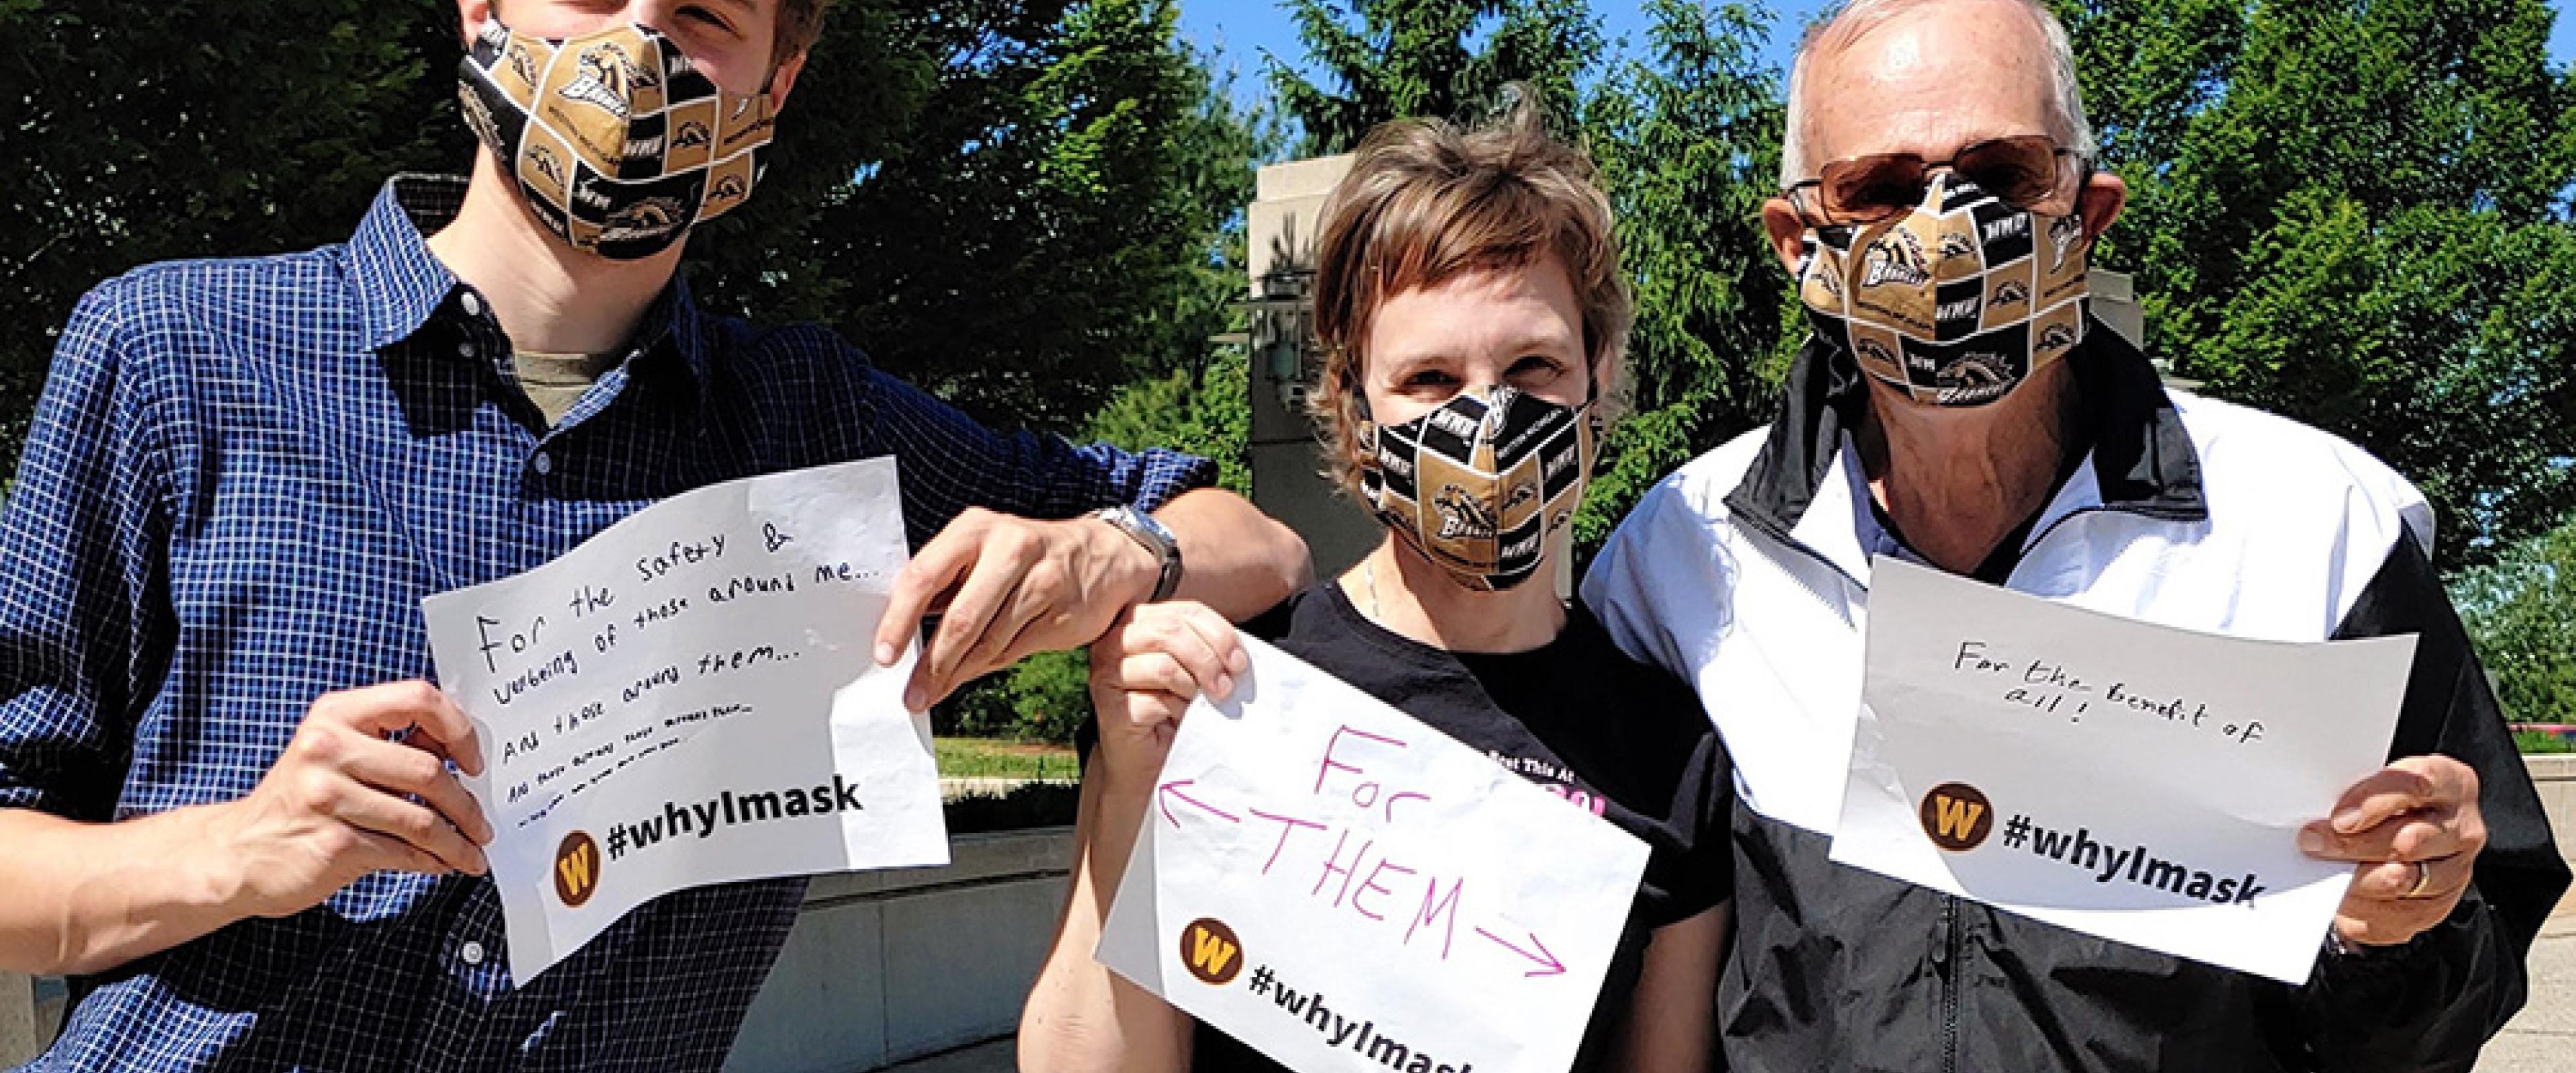 #whyImask